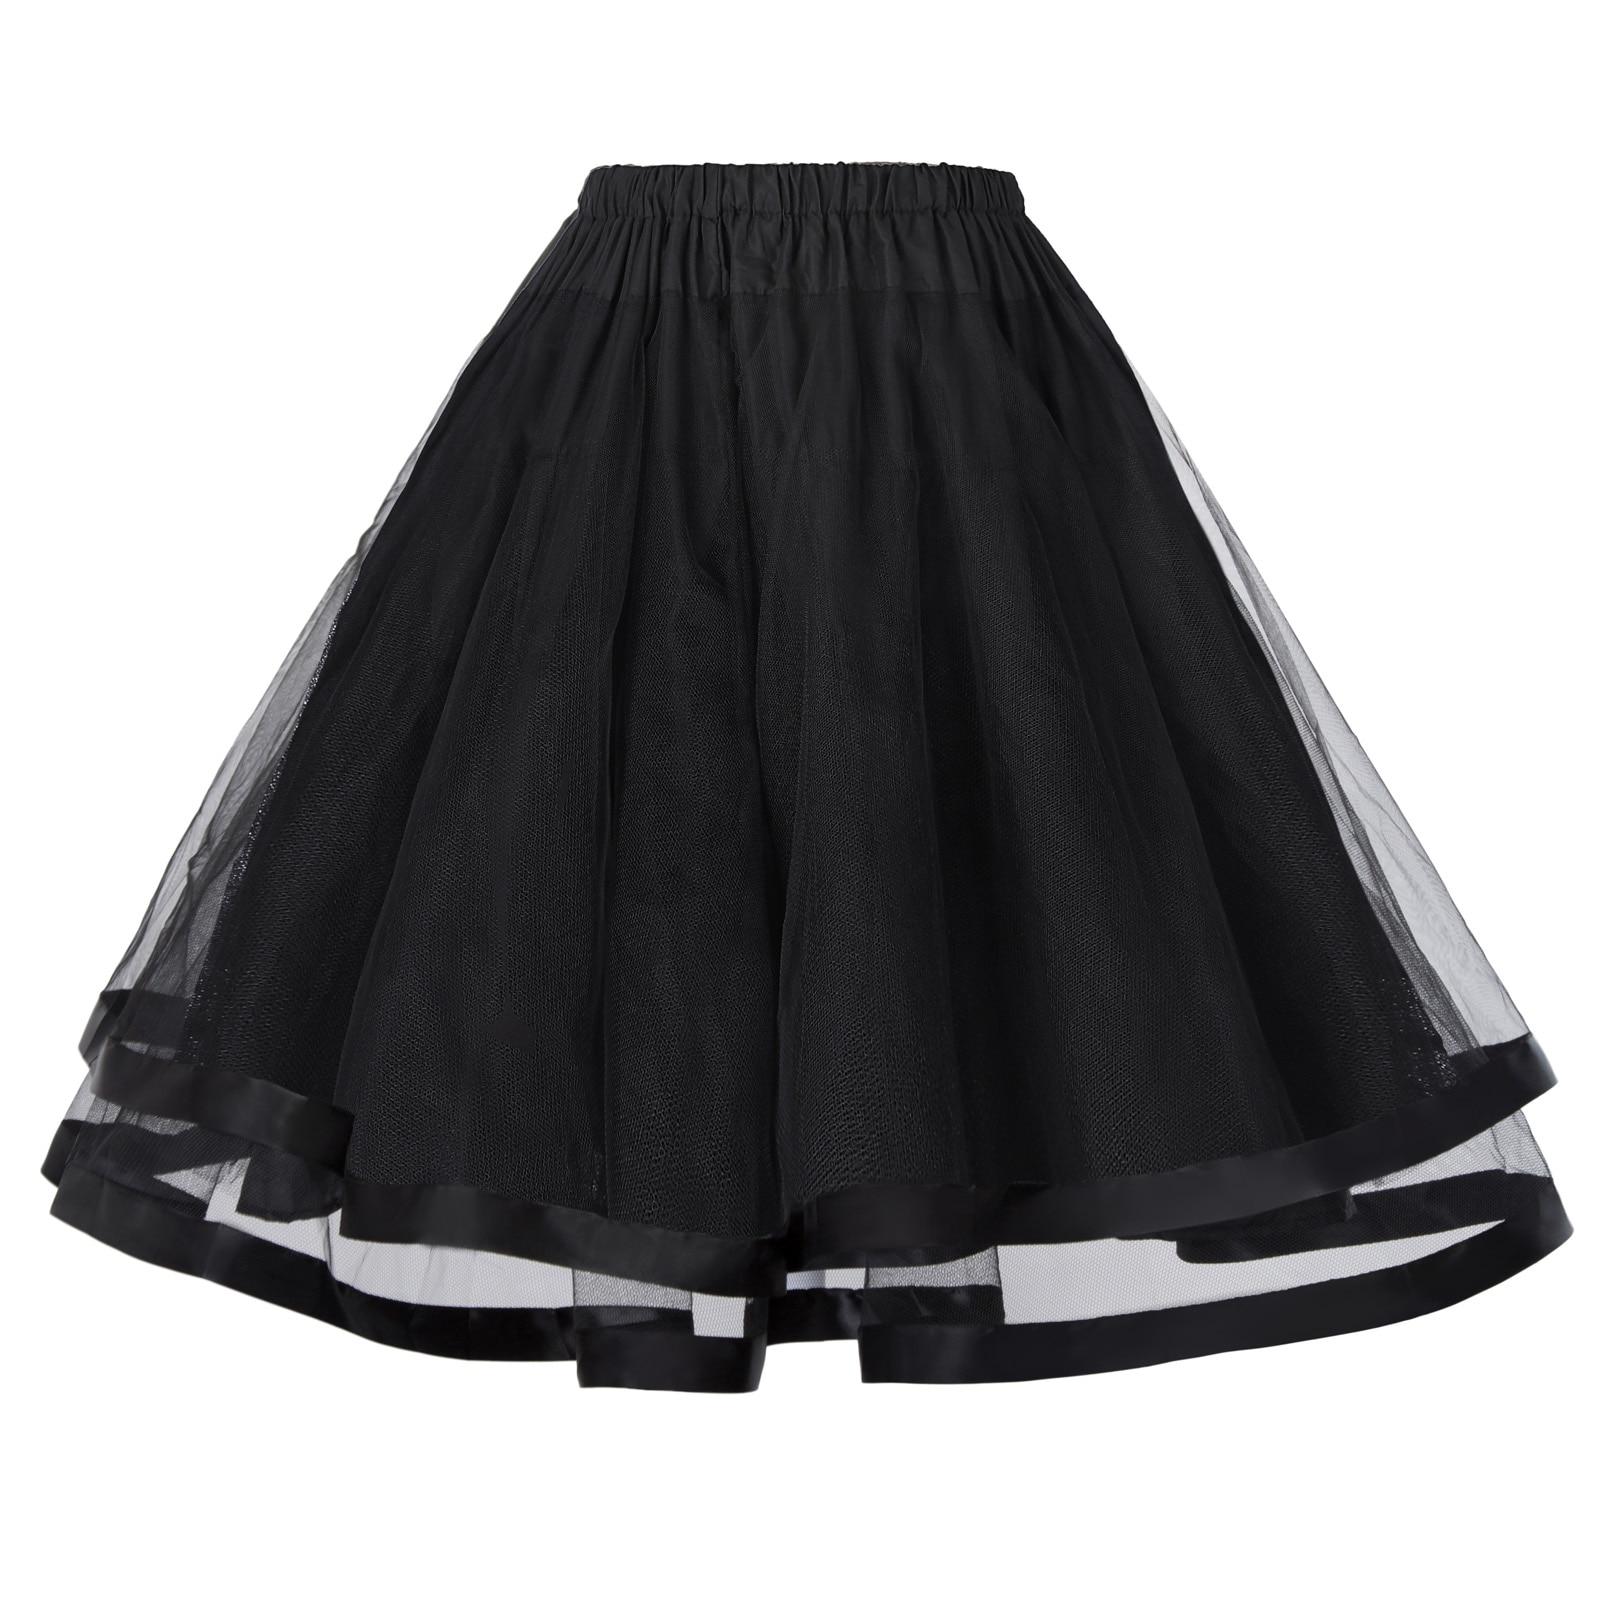 Women Underskirt Crinoline fluffy pettiskirt Retro Vintage 3 Layers Tulle Netting Tutu Skirt Silps swing Rockabilly Petticoat